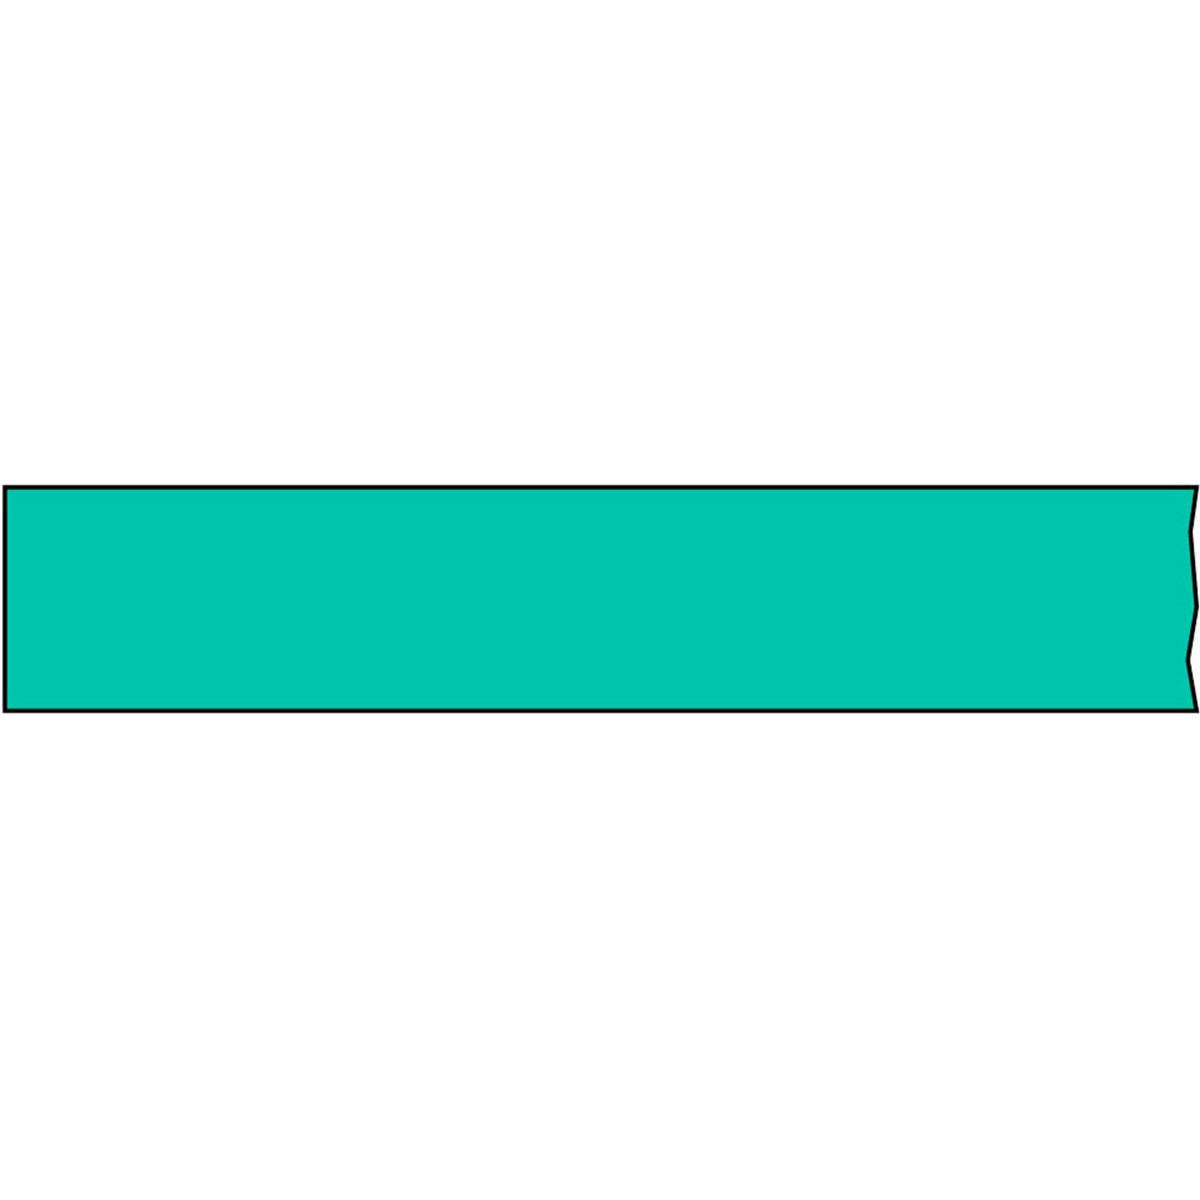 TIMETAPE T-3460-16 Tape, Removable, 3'' Core, 3/4'' x 2160'', Imprints Aqua (Pack of 1)